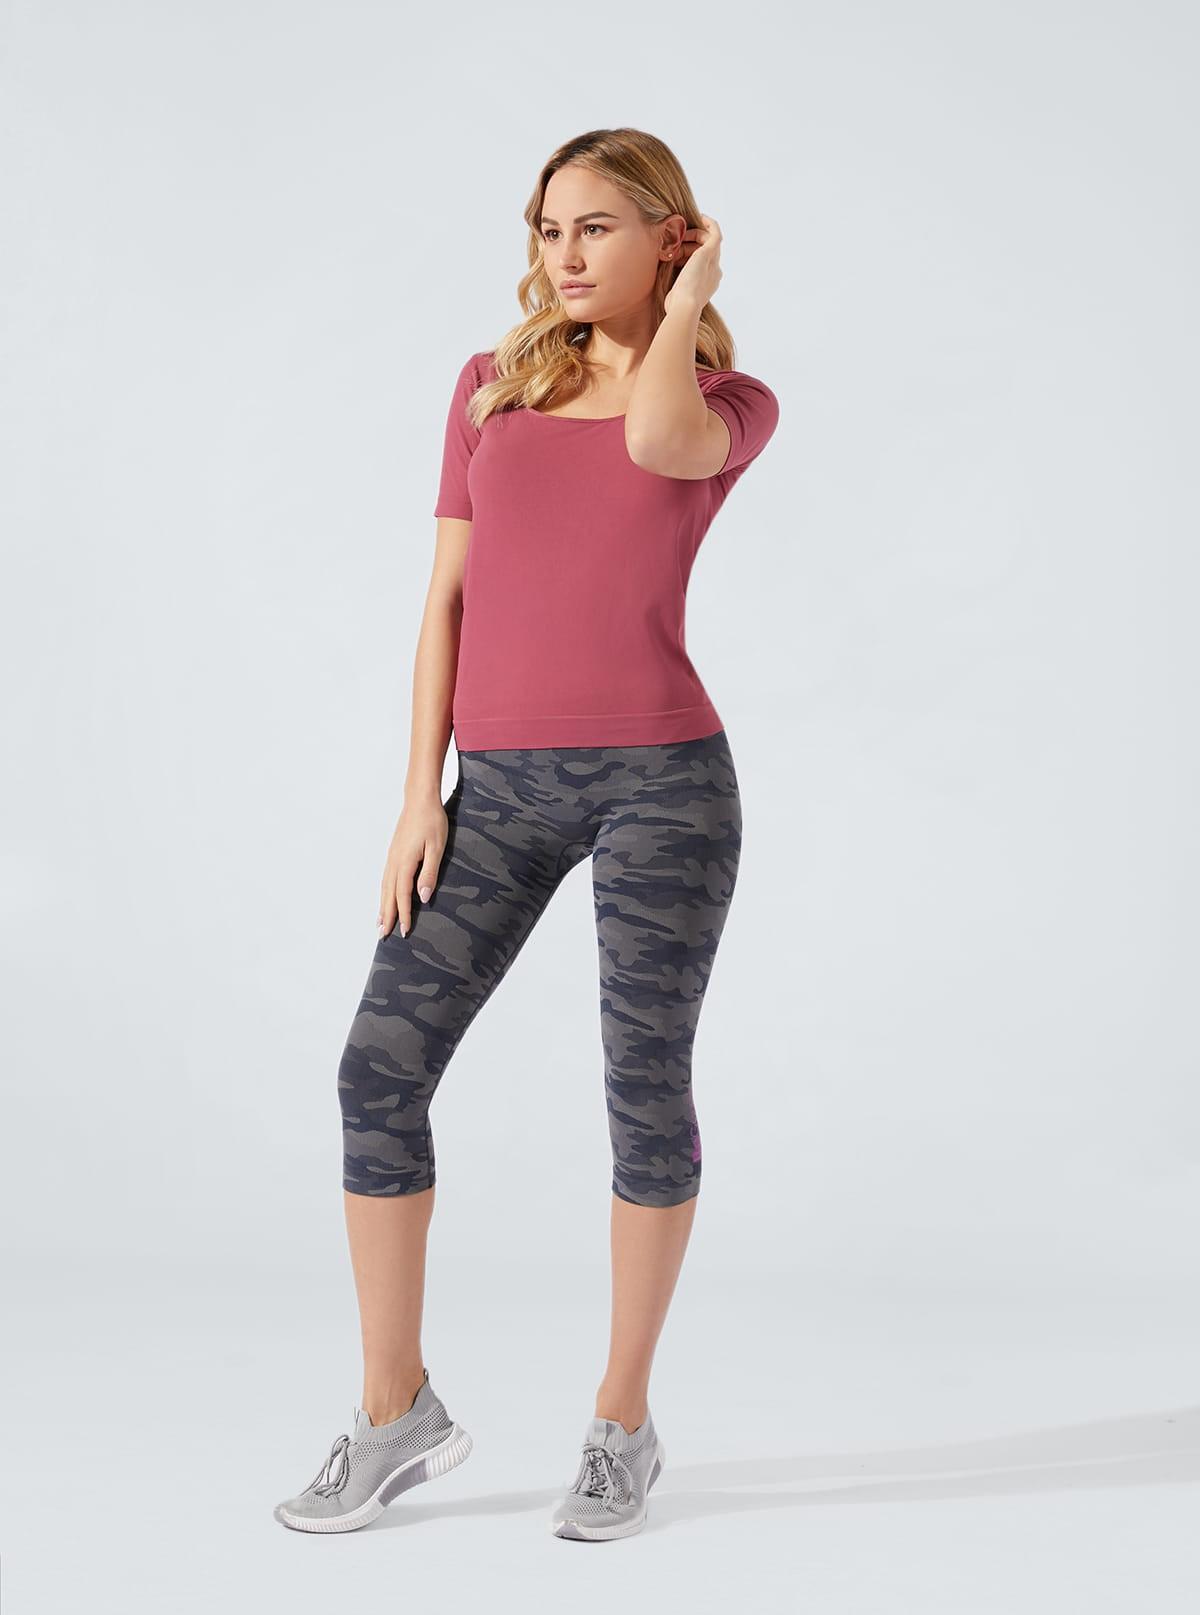 Completo Sport Donna: T-Shirt comfort + Capri Camouflage